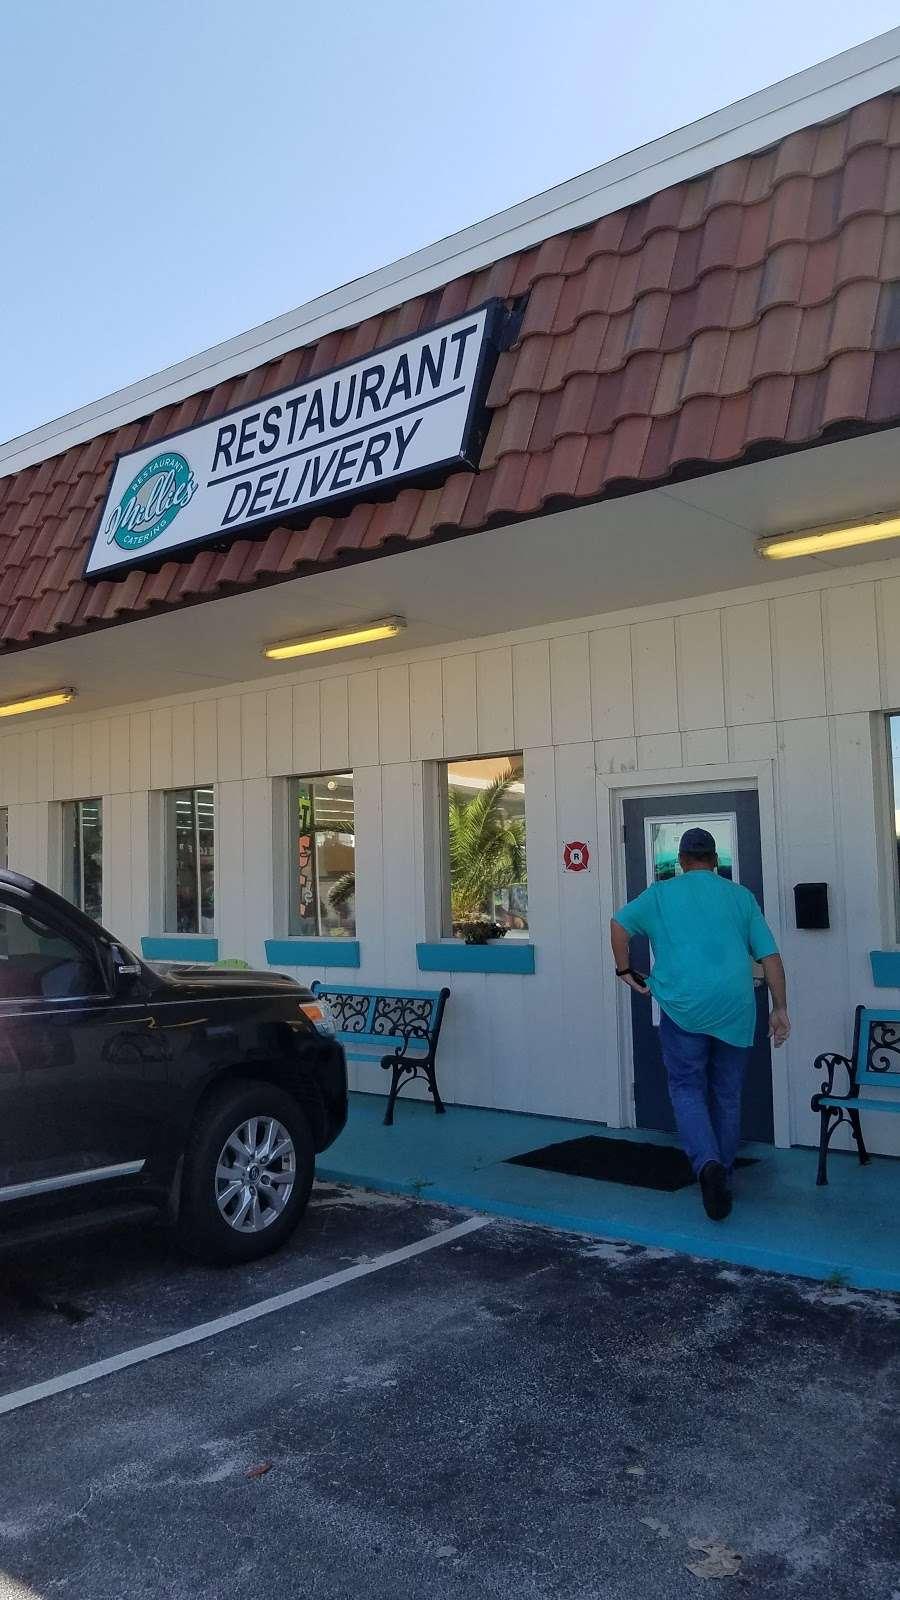 Millies Restaurant & Catering - restaurant  | Photo 3 of 10 | Address: 3218 S Atlantic Ave, Daytona Beach Shores, FL 32118, USA | Phone: (386) 275-1492